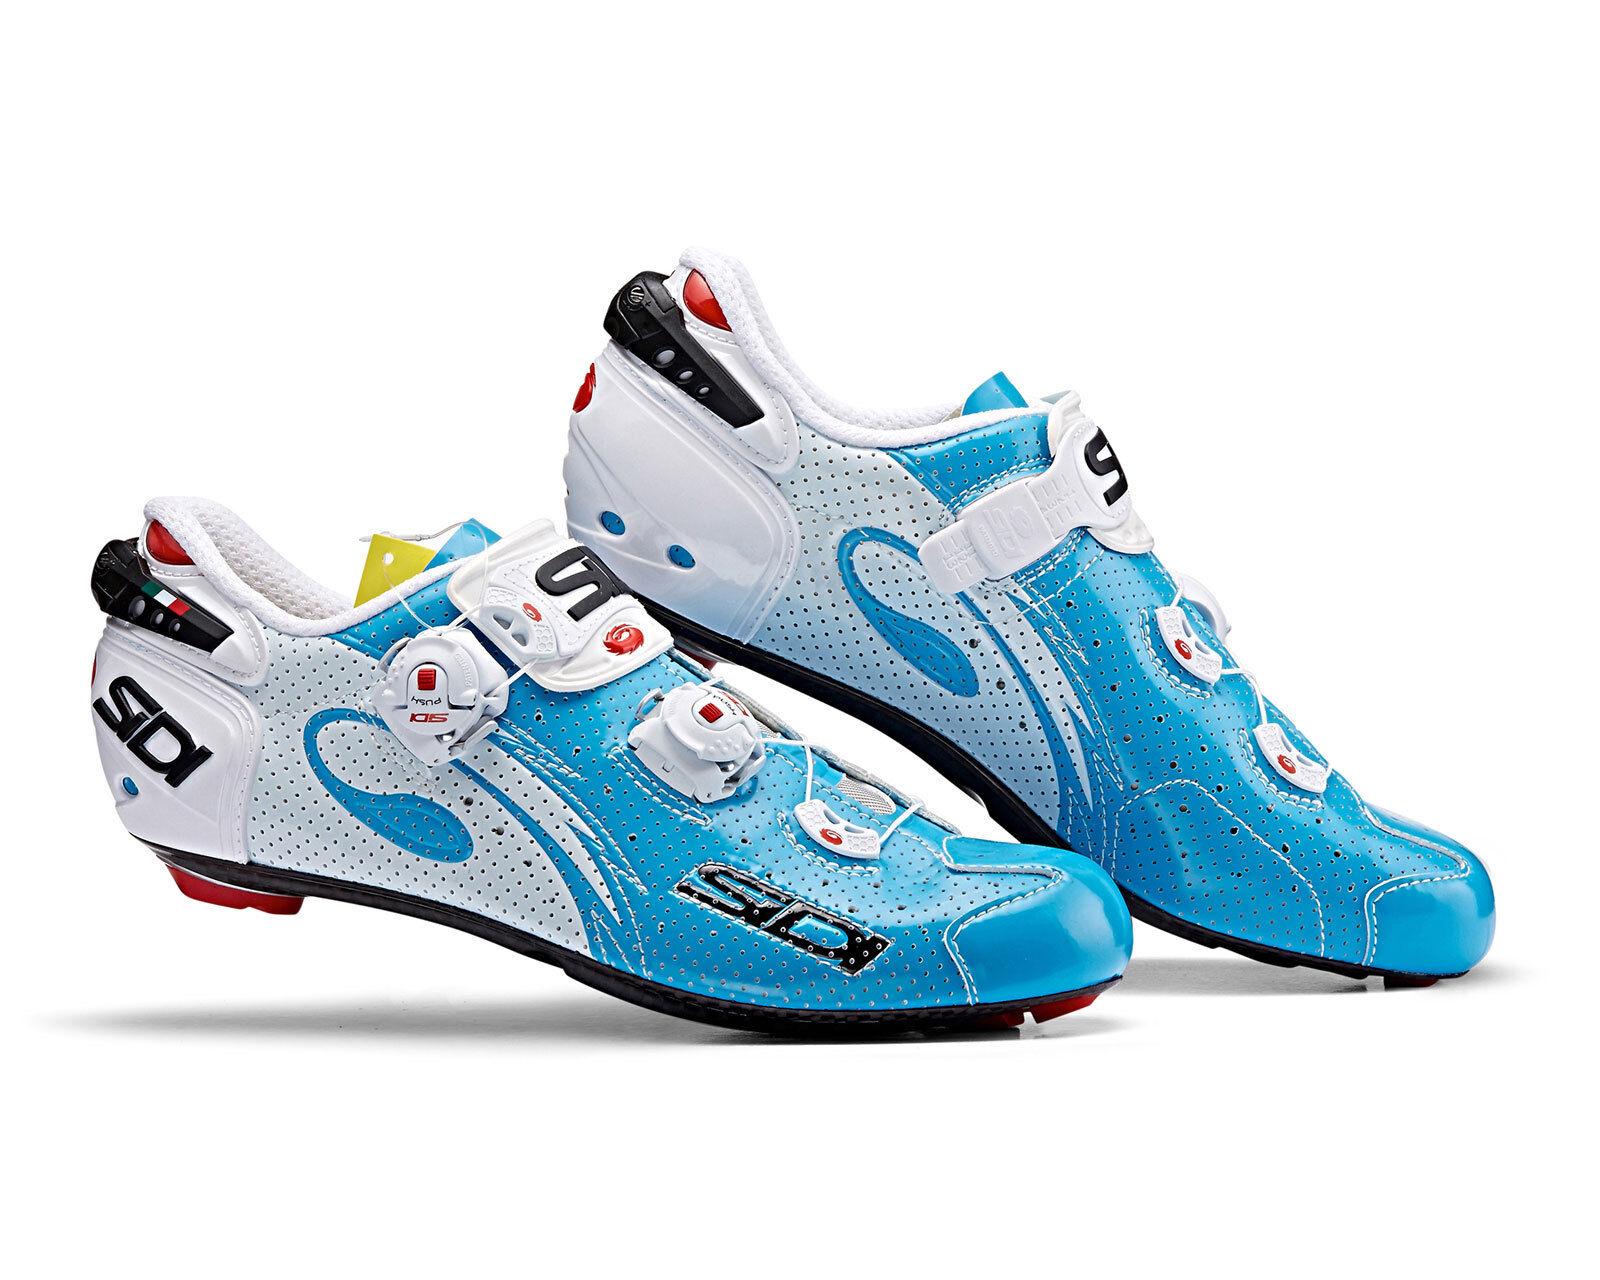 Alambre Sidi Cochebono aire road cycling zapatos-cielo azul blancoo